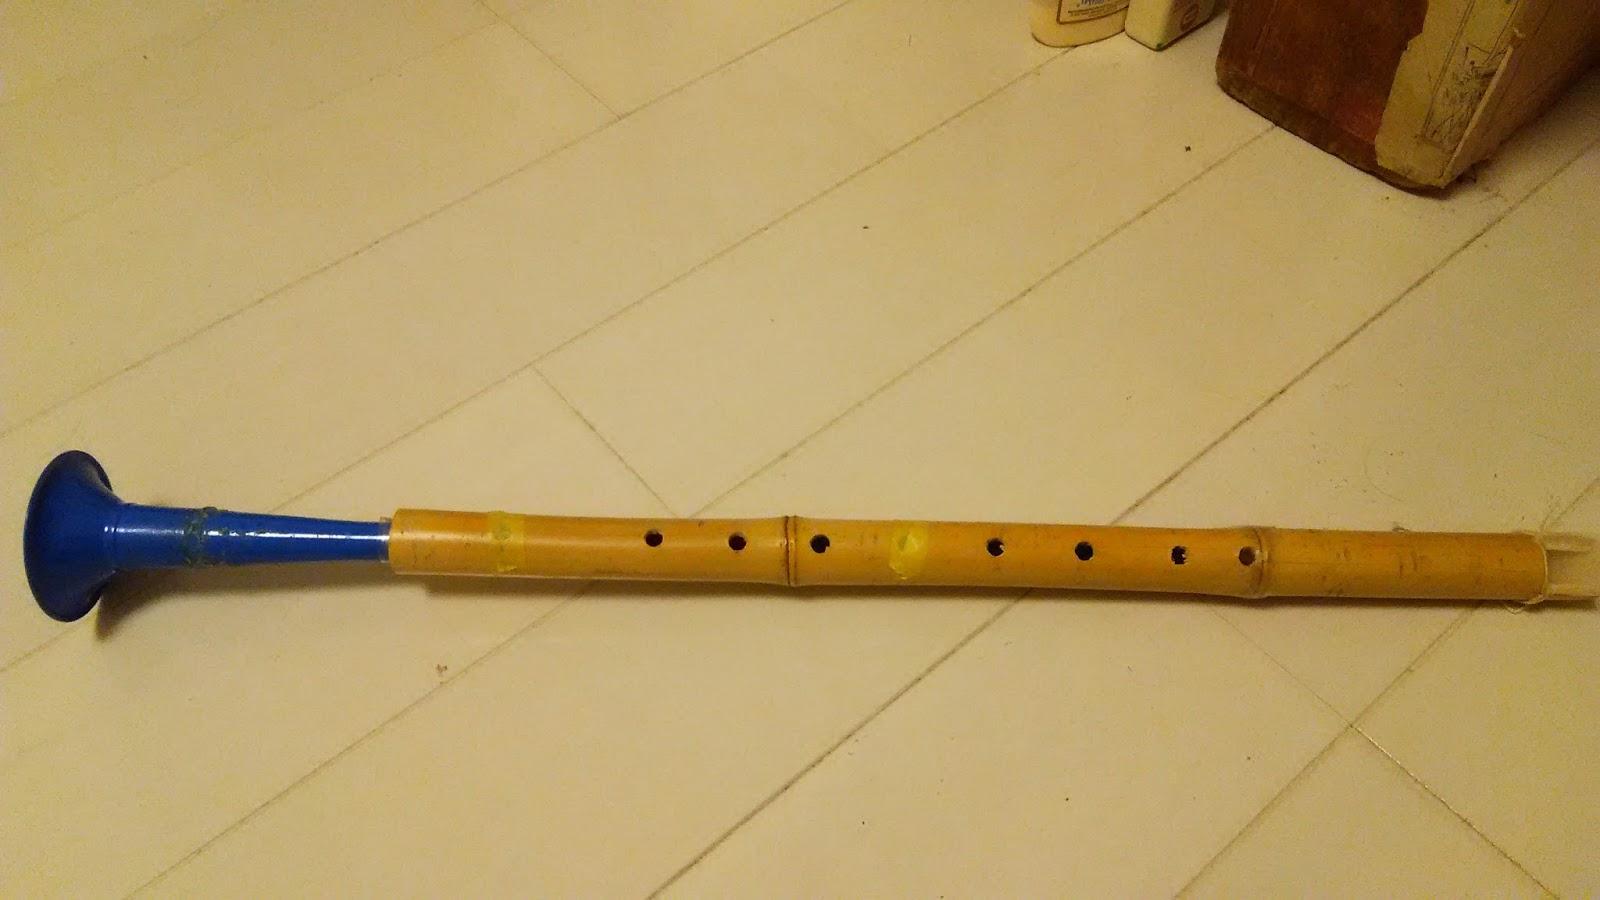 Bamboo sax how to make